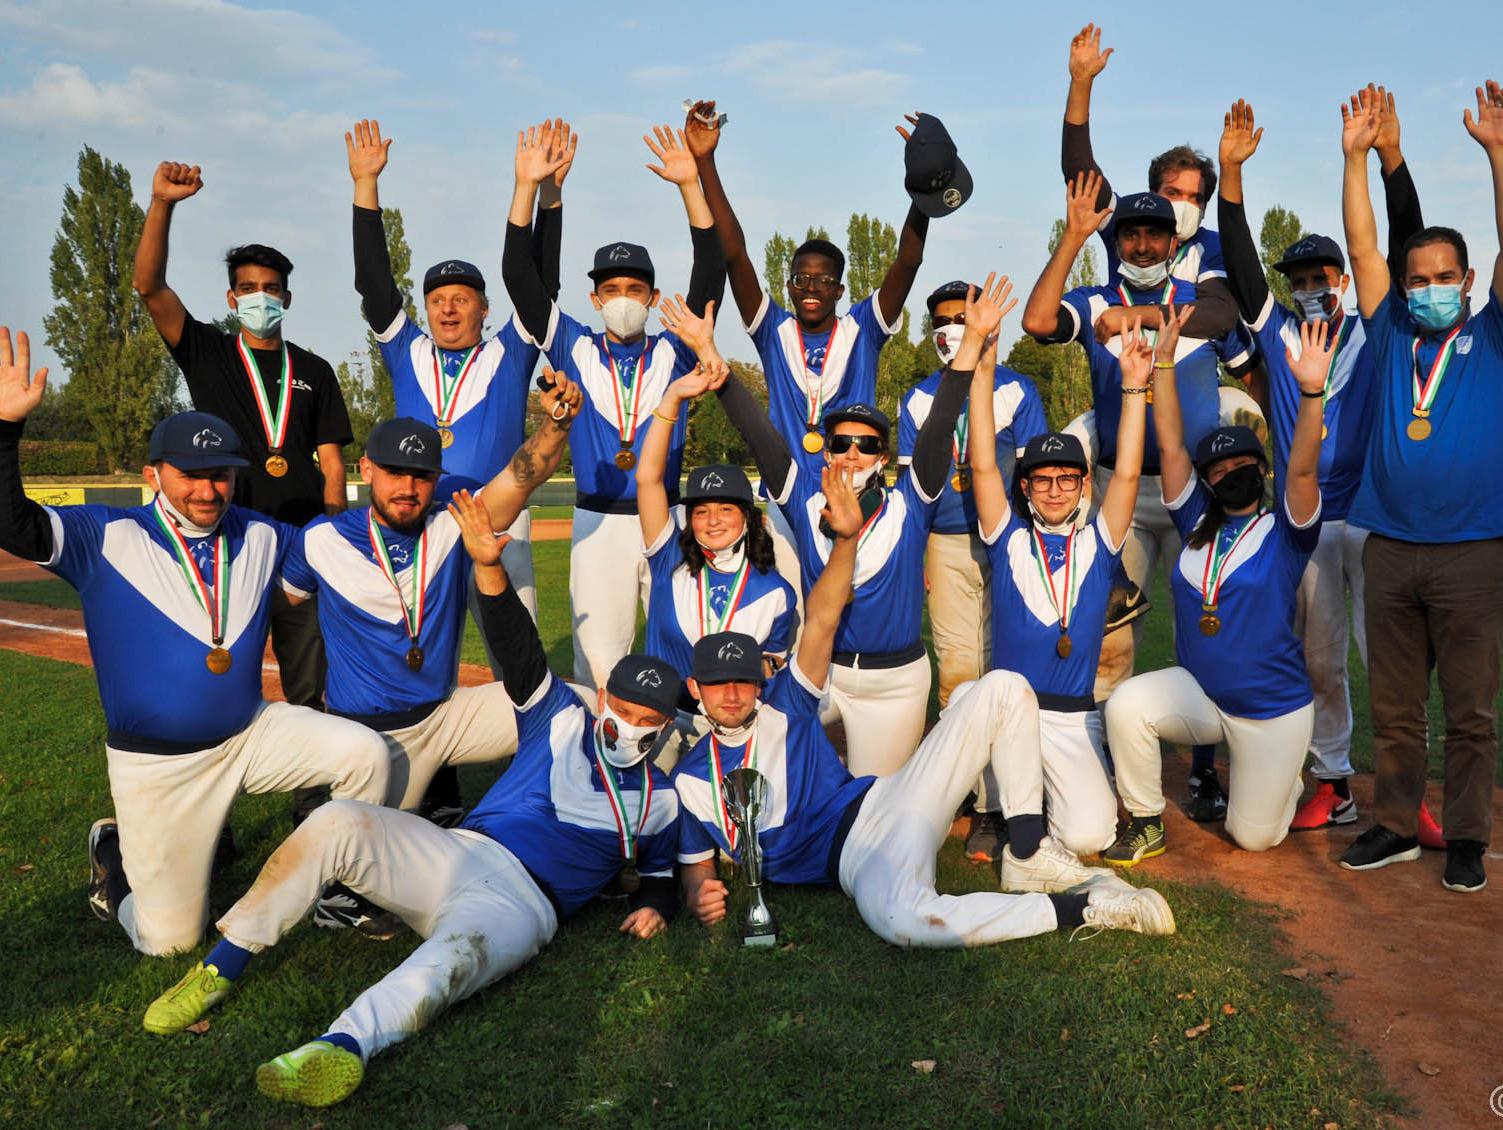 Leonessa Brescia triumphed in the final of the Italian Baseball for the Blind Championship ©Lauro Bassani/AIBxC